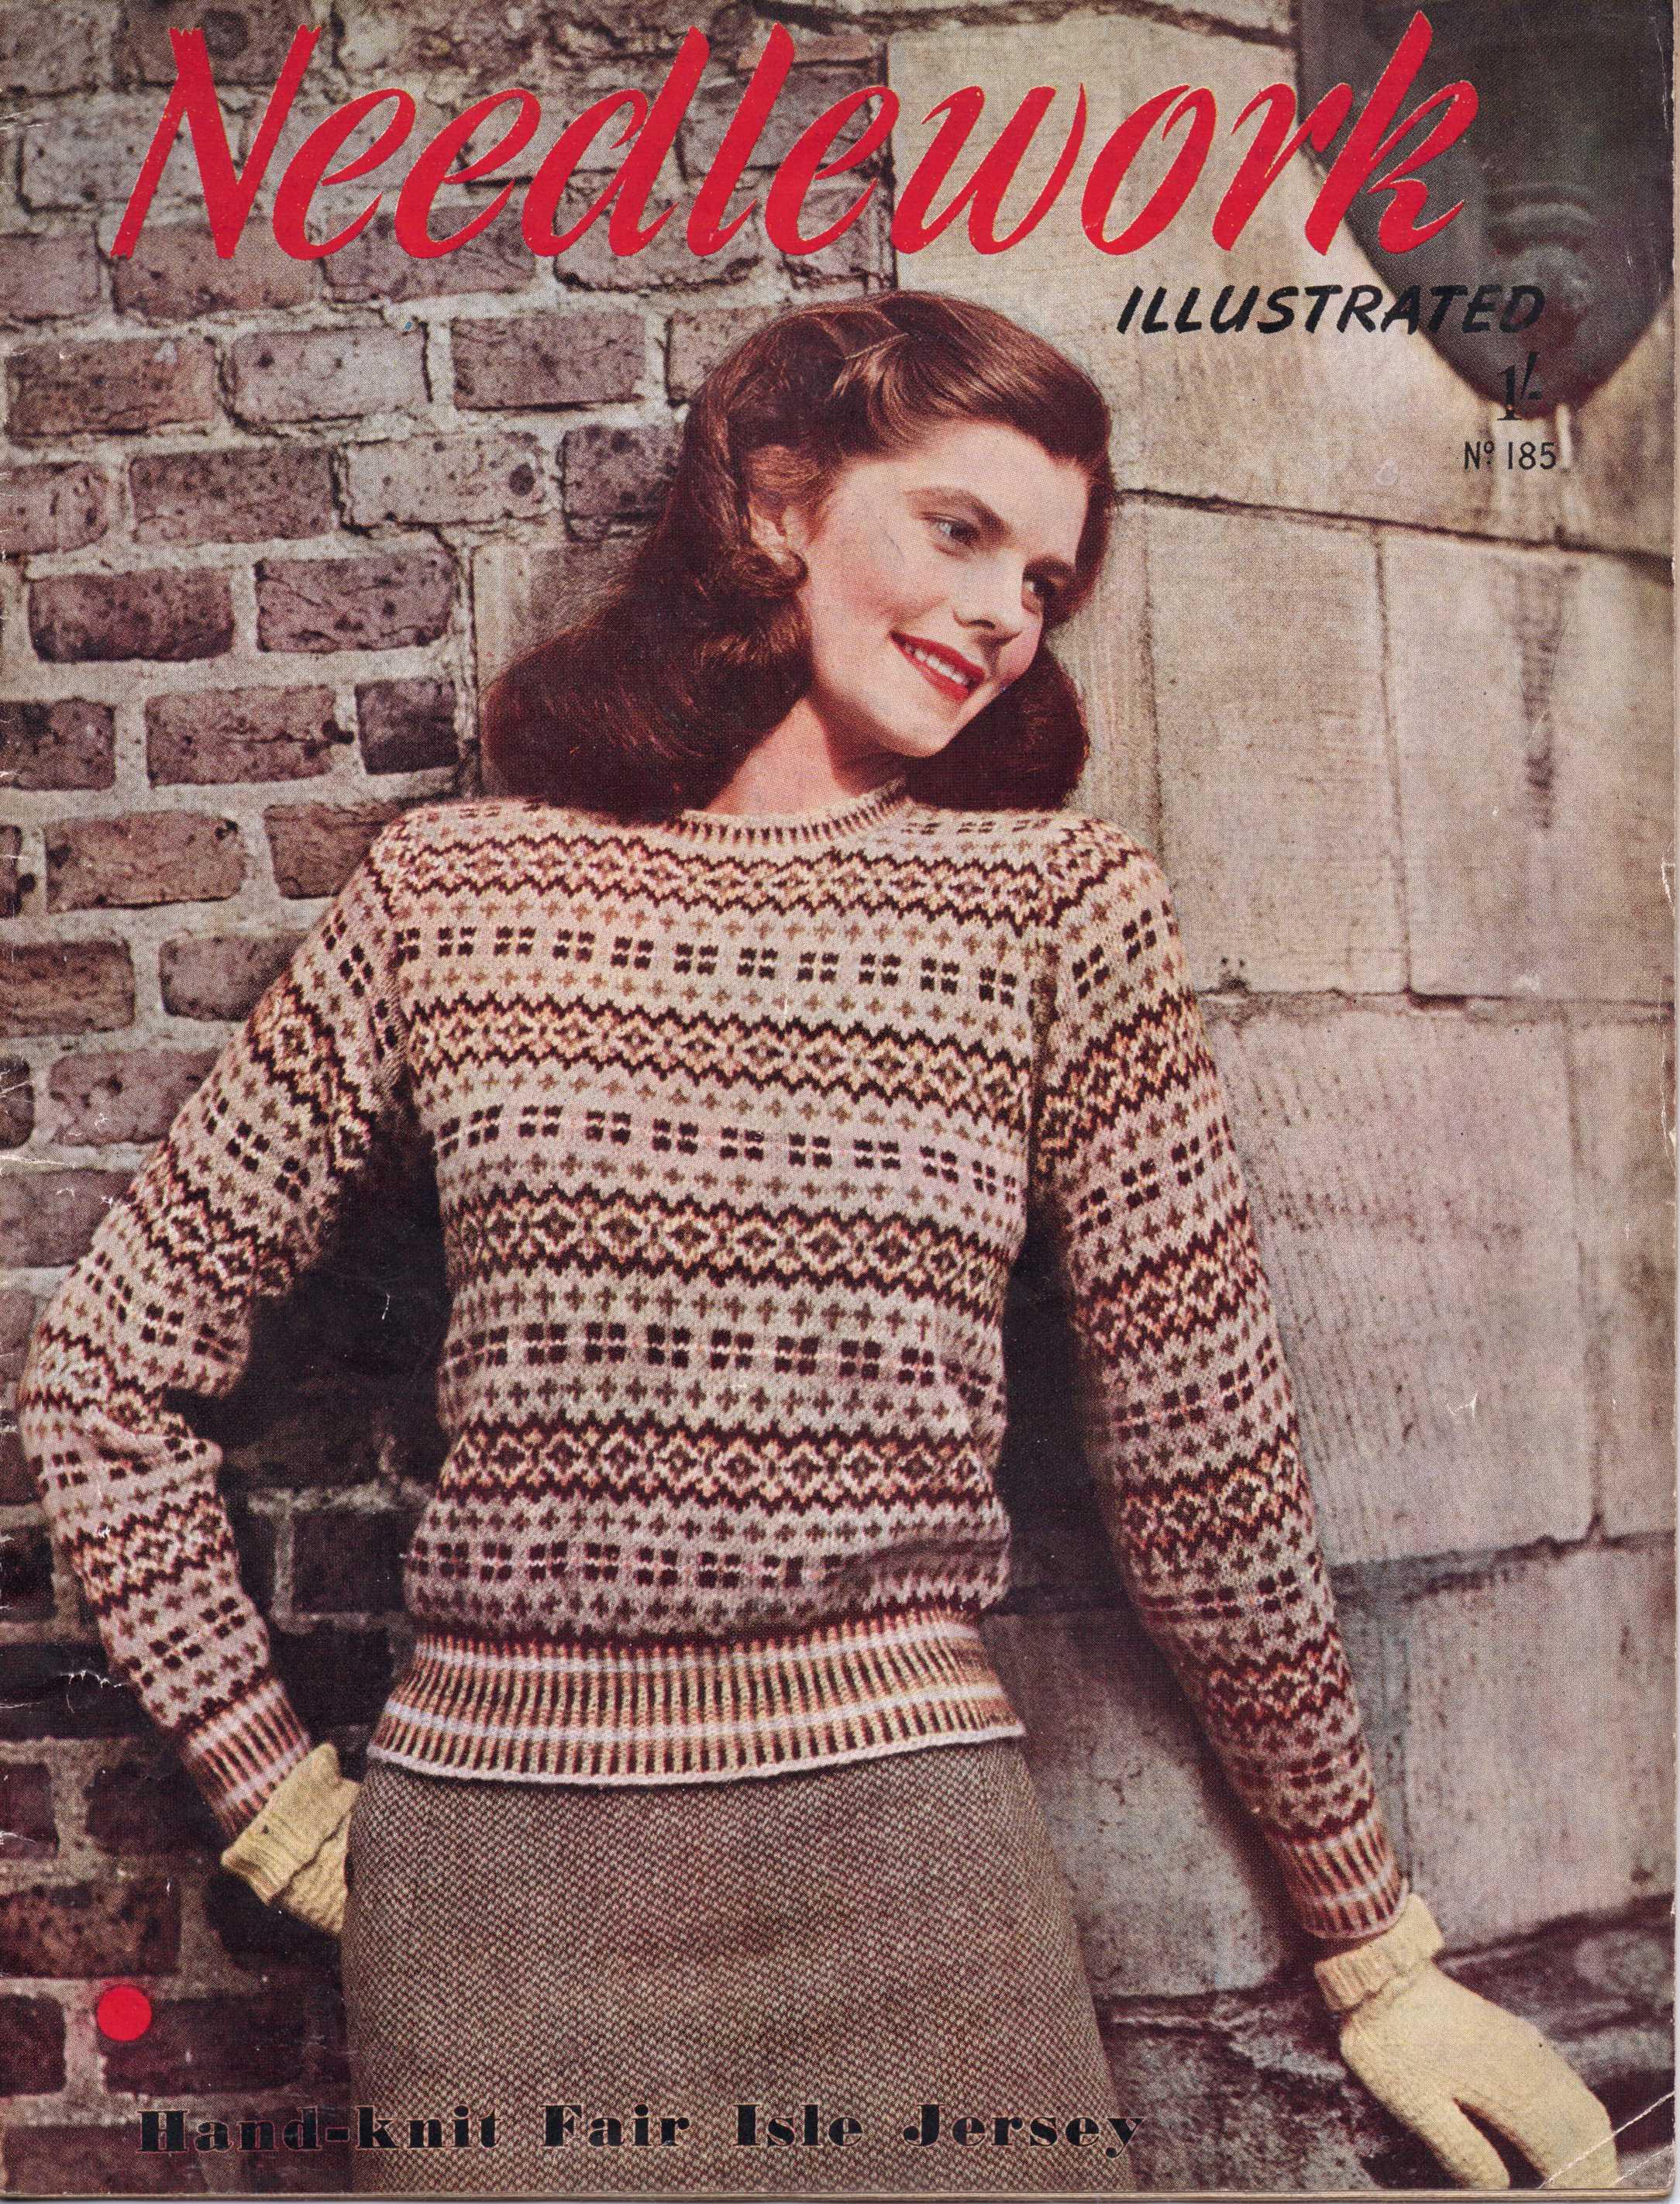 Fairisle Knitting Patterns Free Vintage Fair Isle Knitting Patterns Crochet And Knit